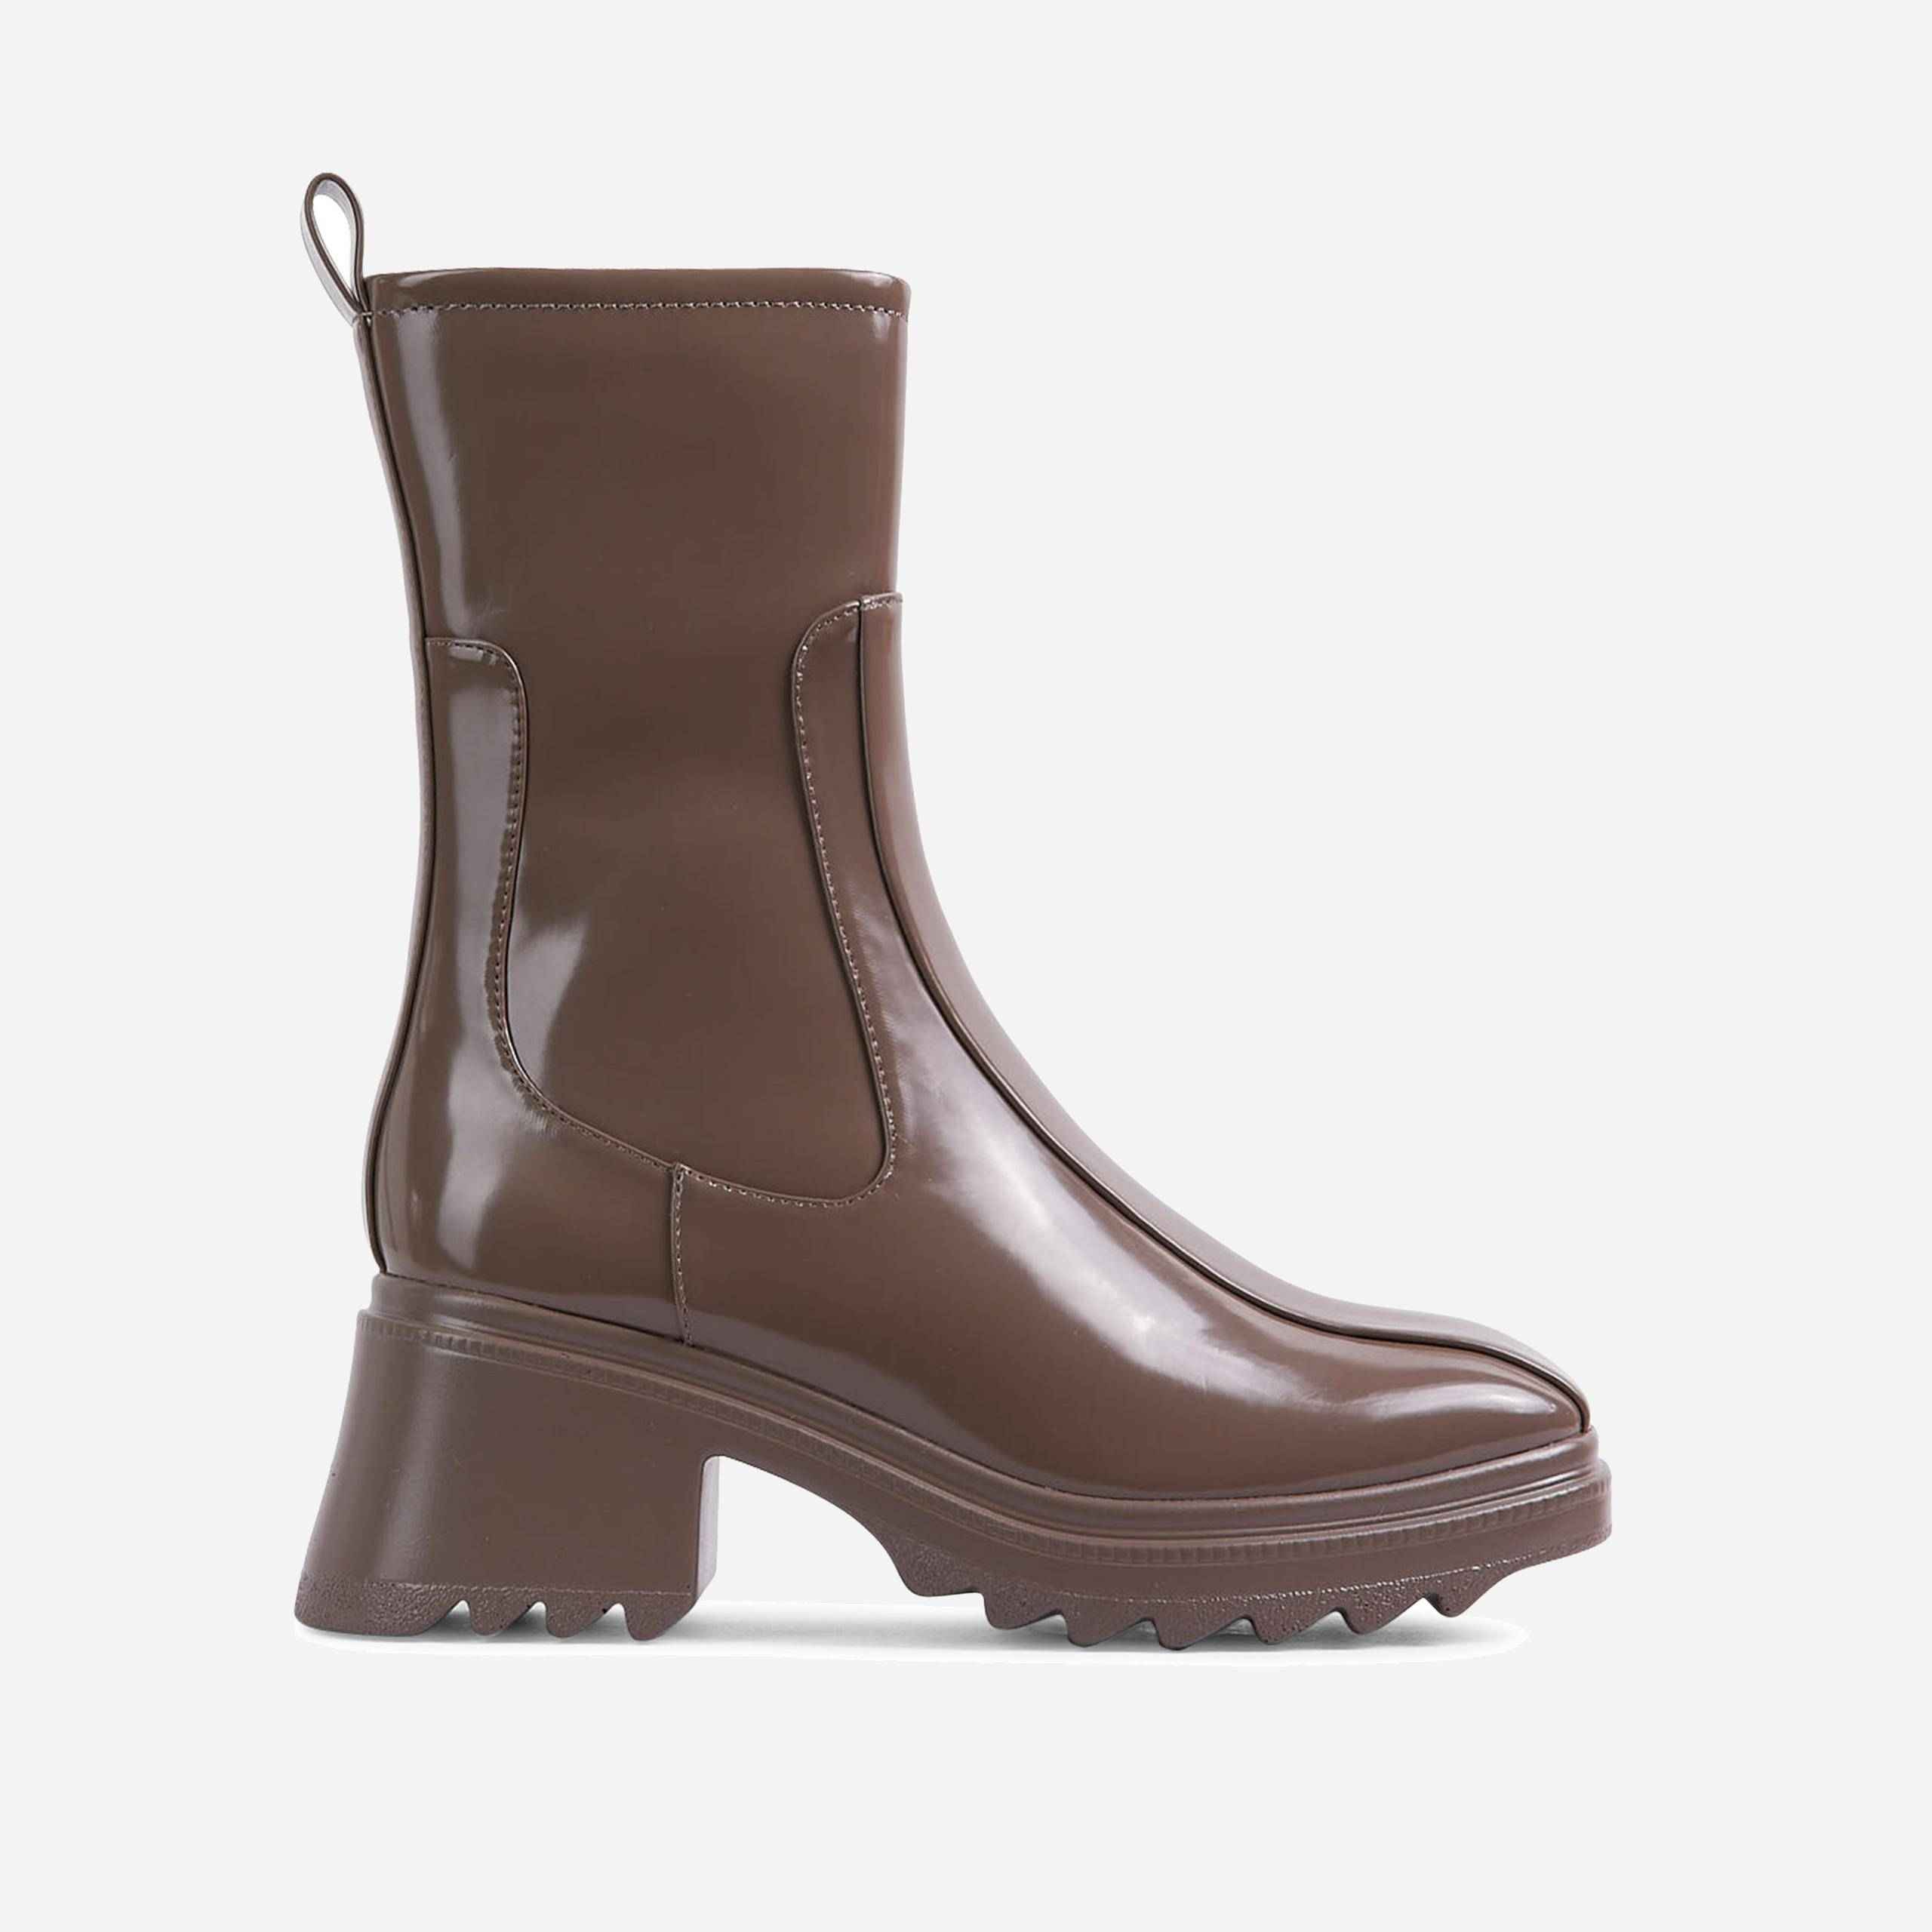 EGO Rain-On-Me Block Heel Ankle Wellington Boot In Khaki Green, Green  - female - Size: 5